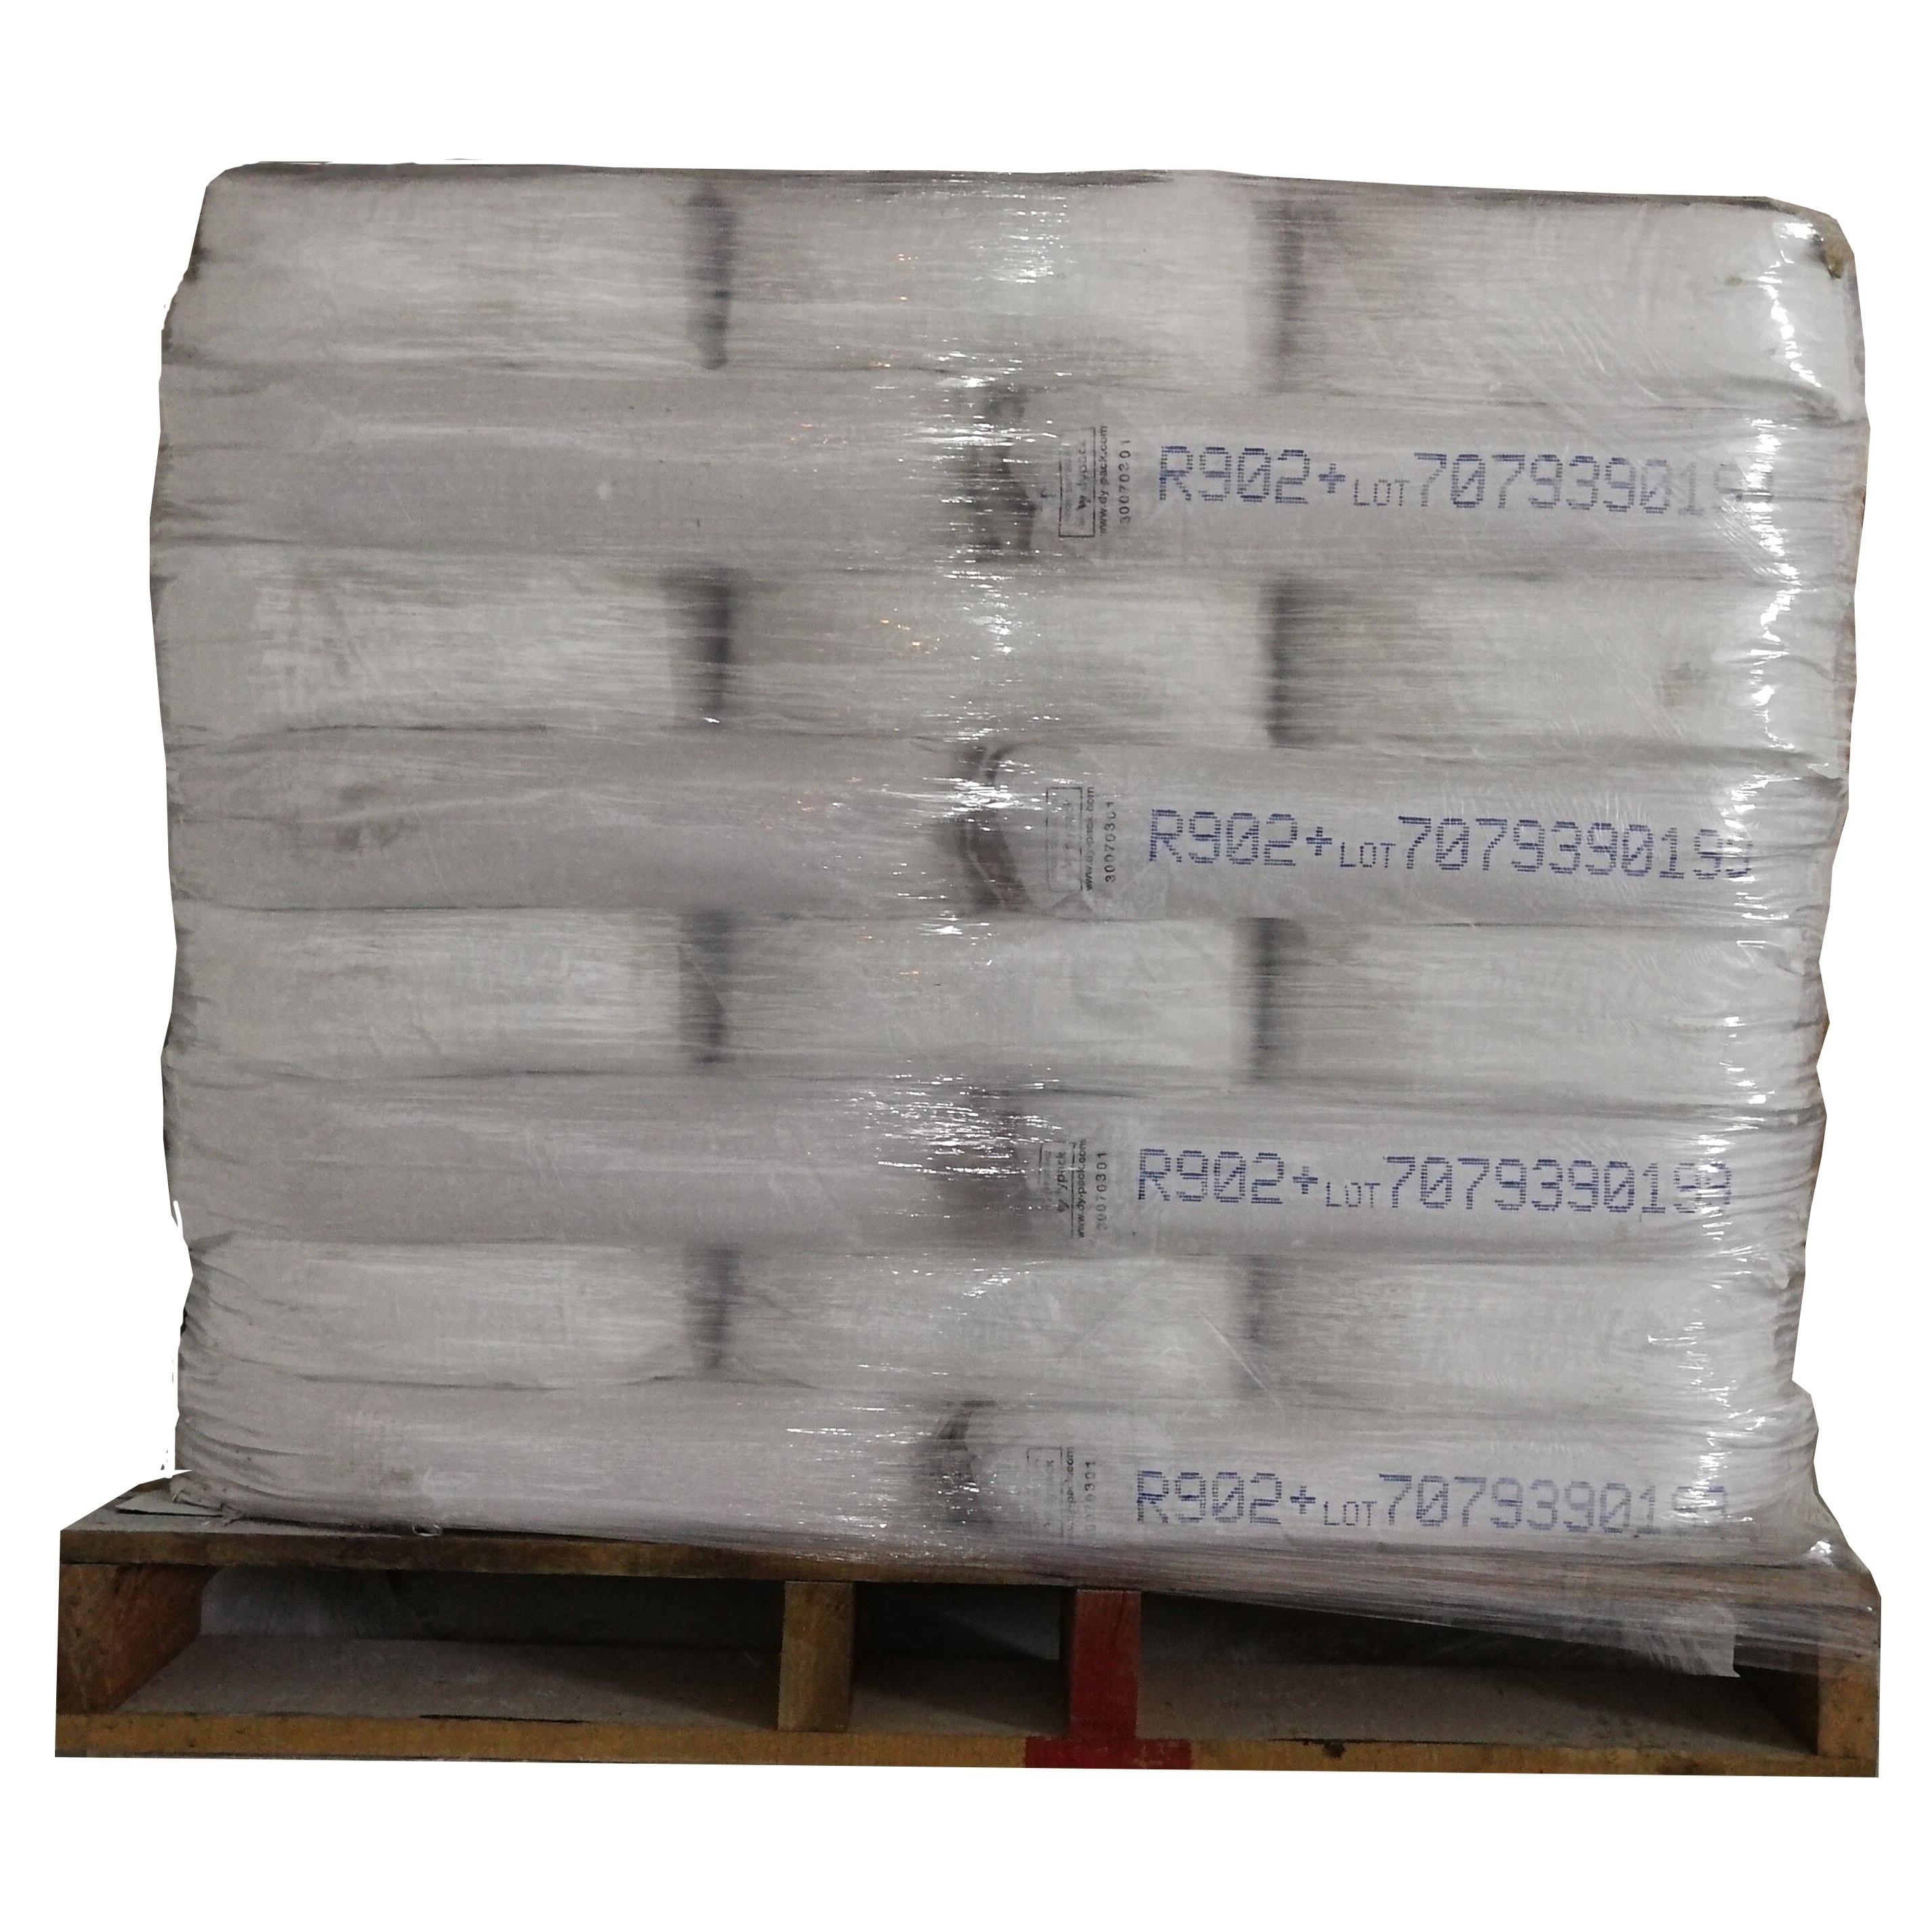 Tio2 Rutile Grade Titanium Dioxide R 902 White Powder Pigment For Paint -  Buy Pigment Powder For Paint,White Pigment For Coating,Titanium Dioxide